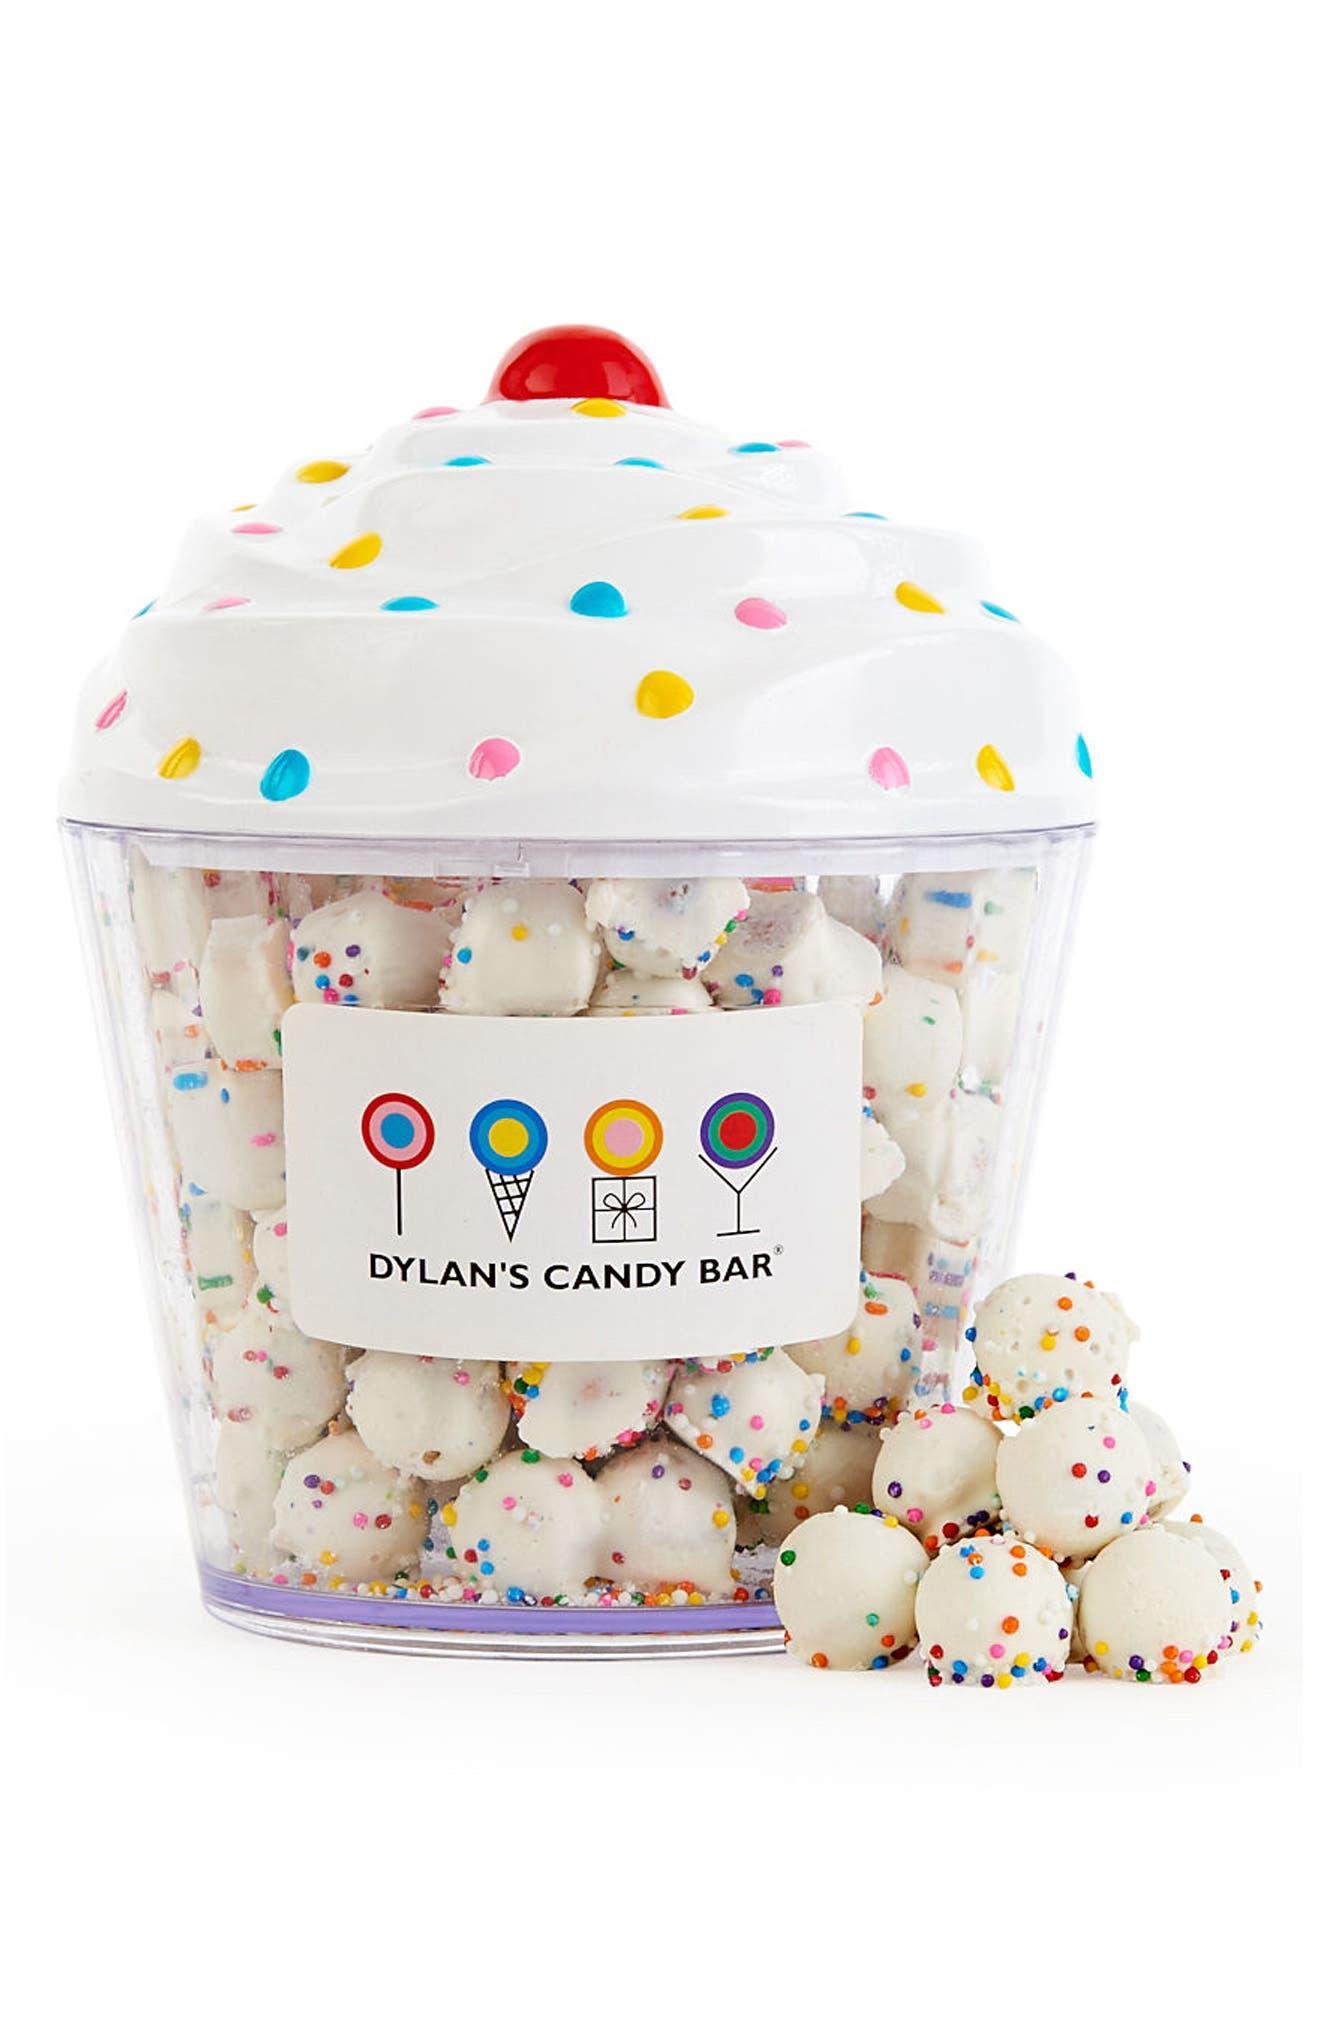 Dylan's Candy Bar White Chocolate Pretzel Balls Cupcake